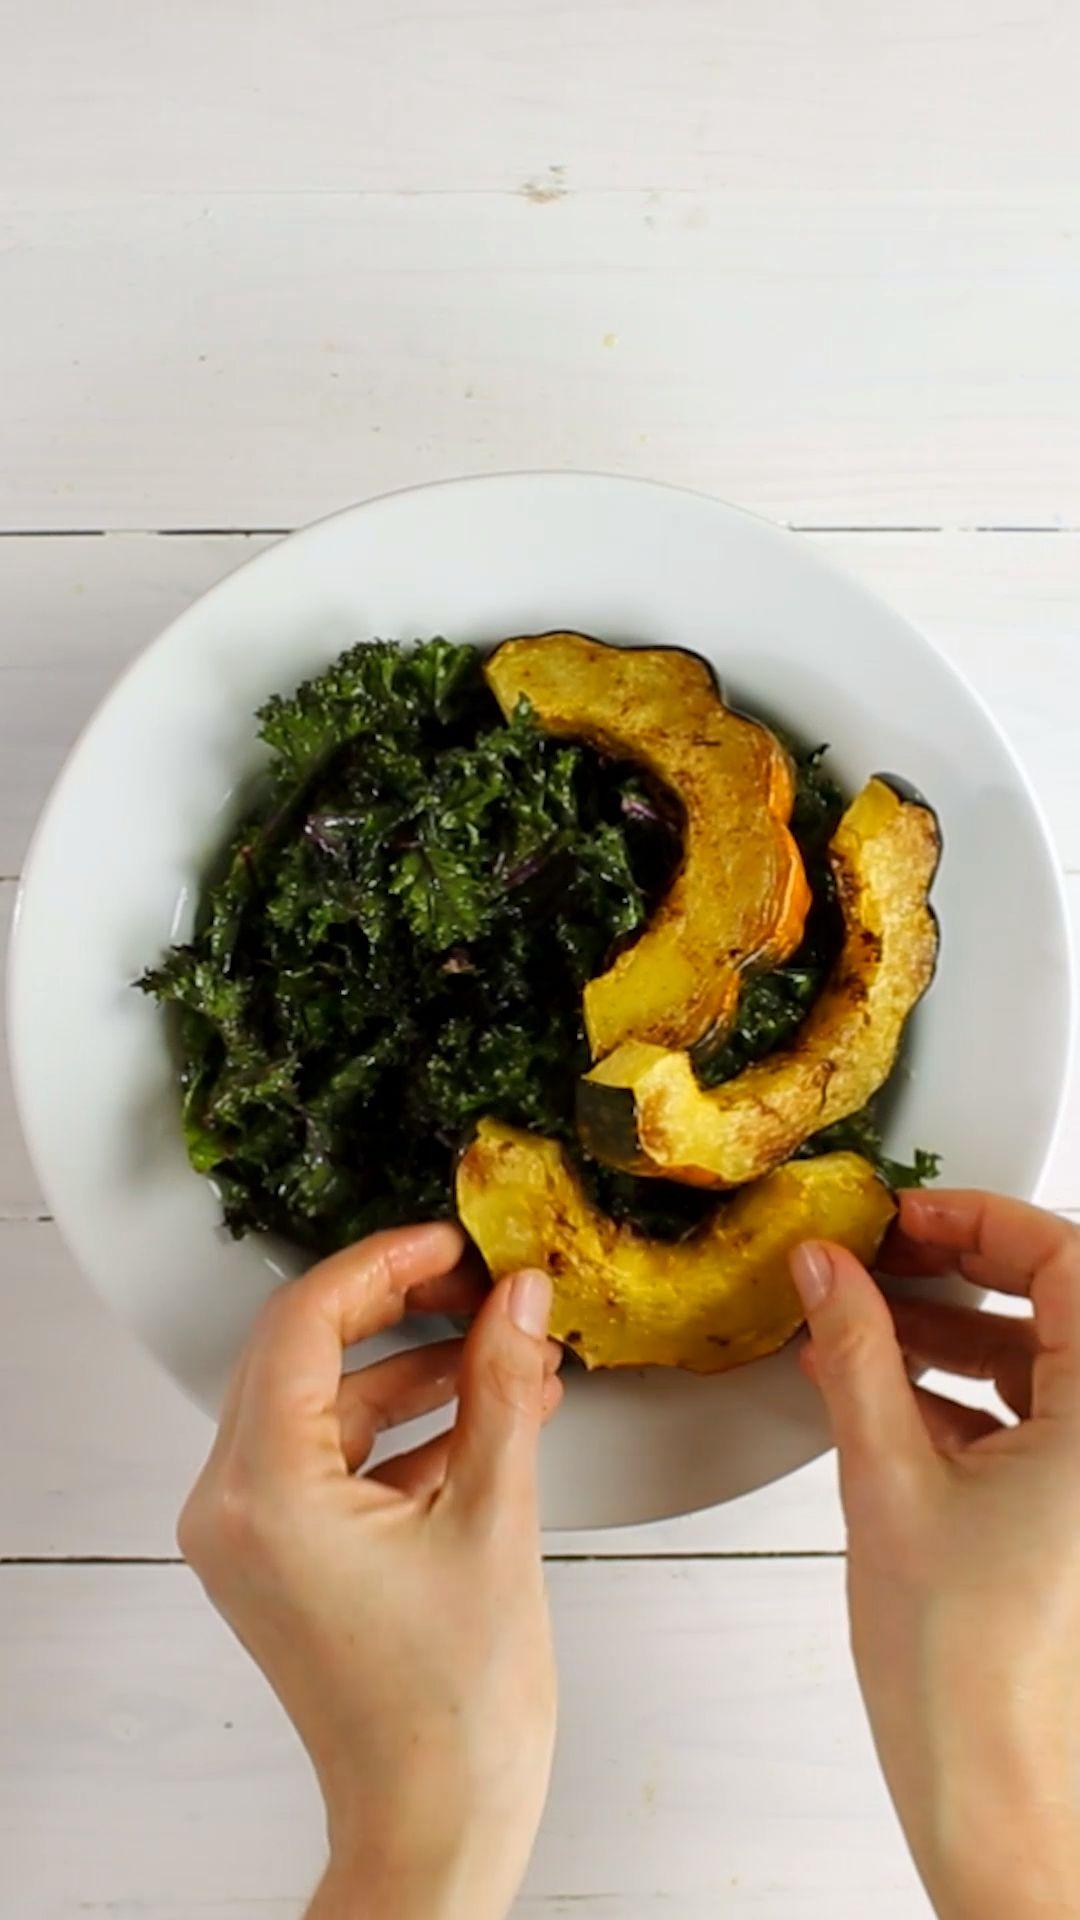 Roasted Acorn Squash & Kale Salad